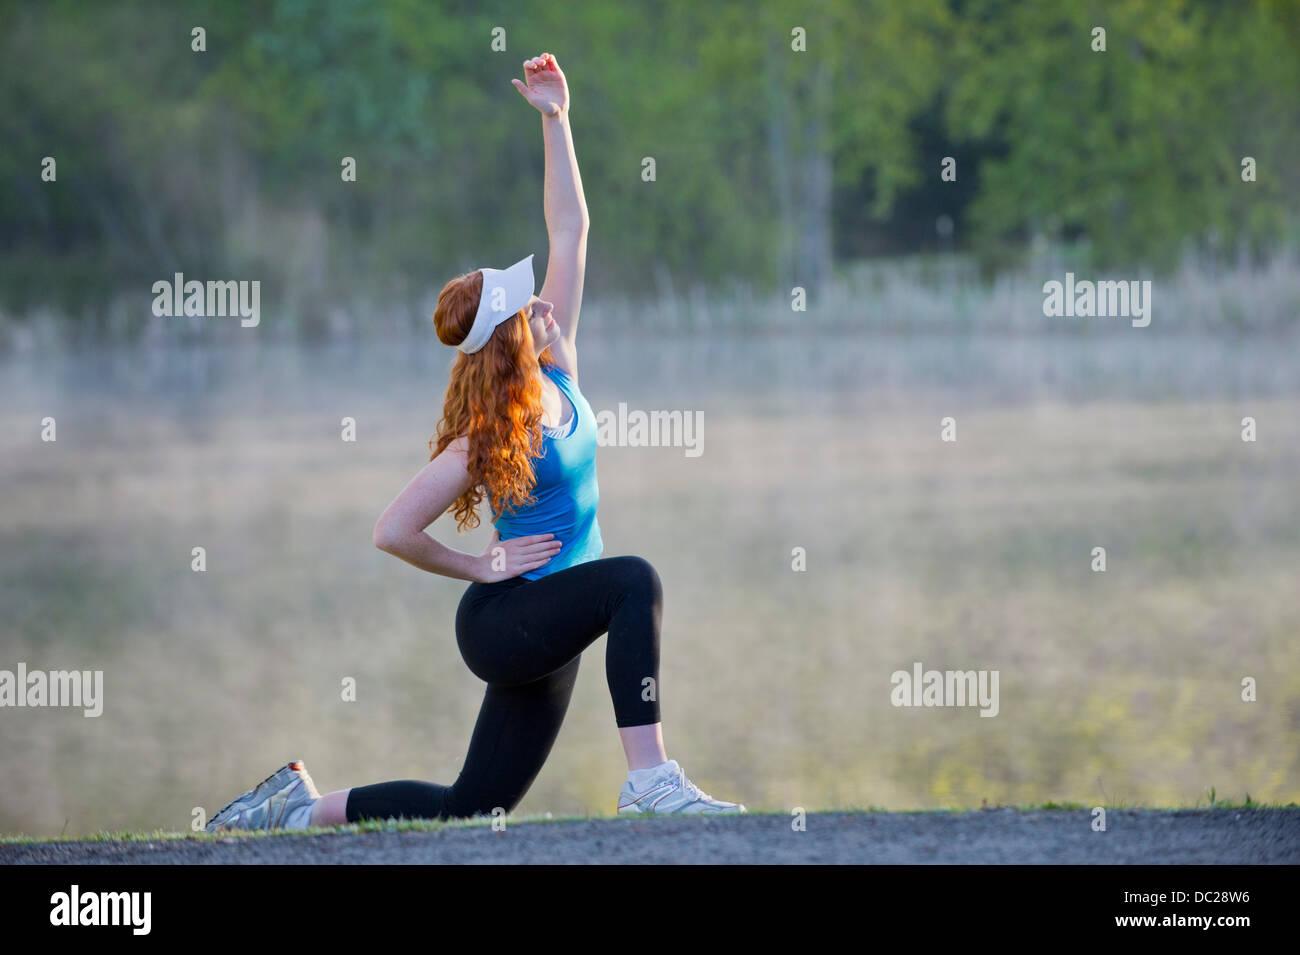 Teenage girl in sportswear stretching Photo Stock